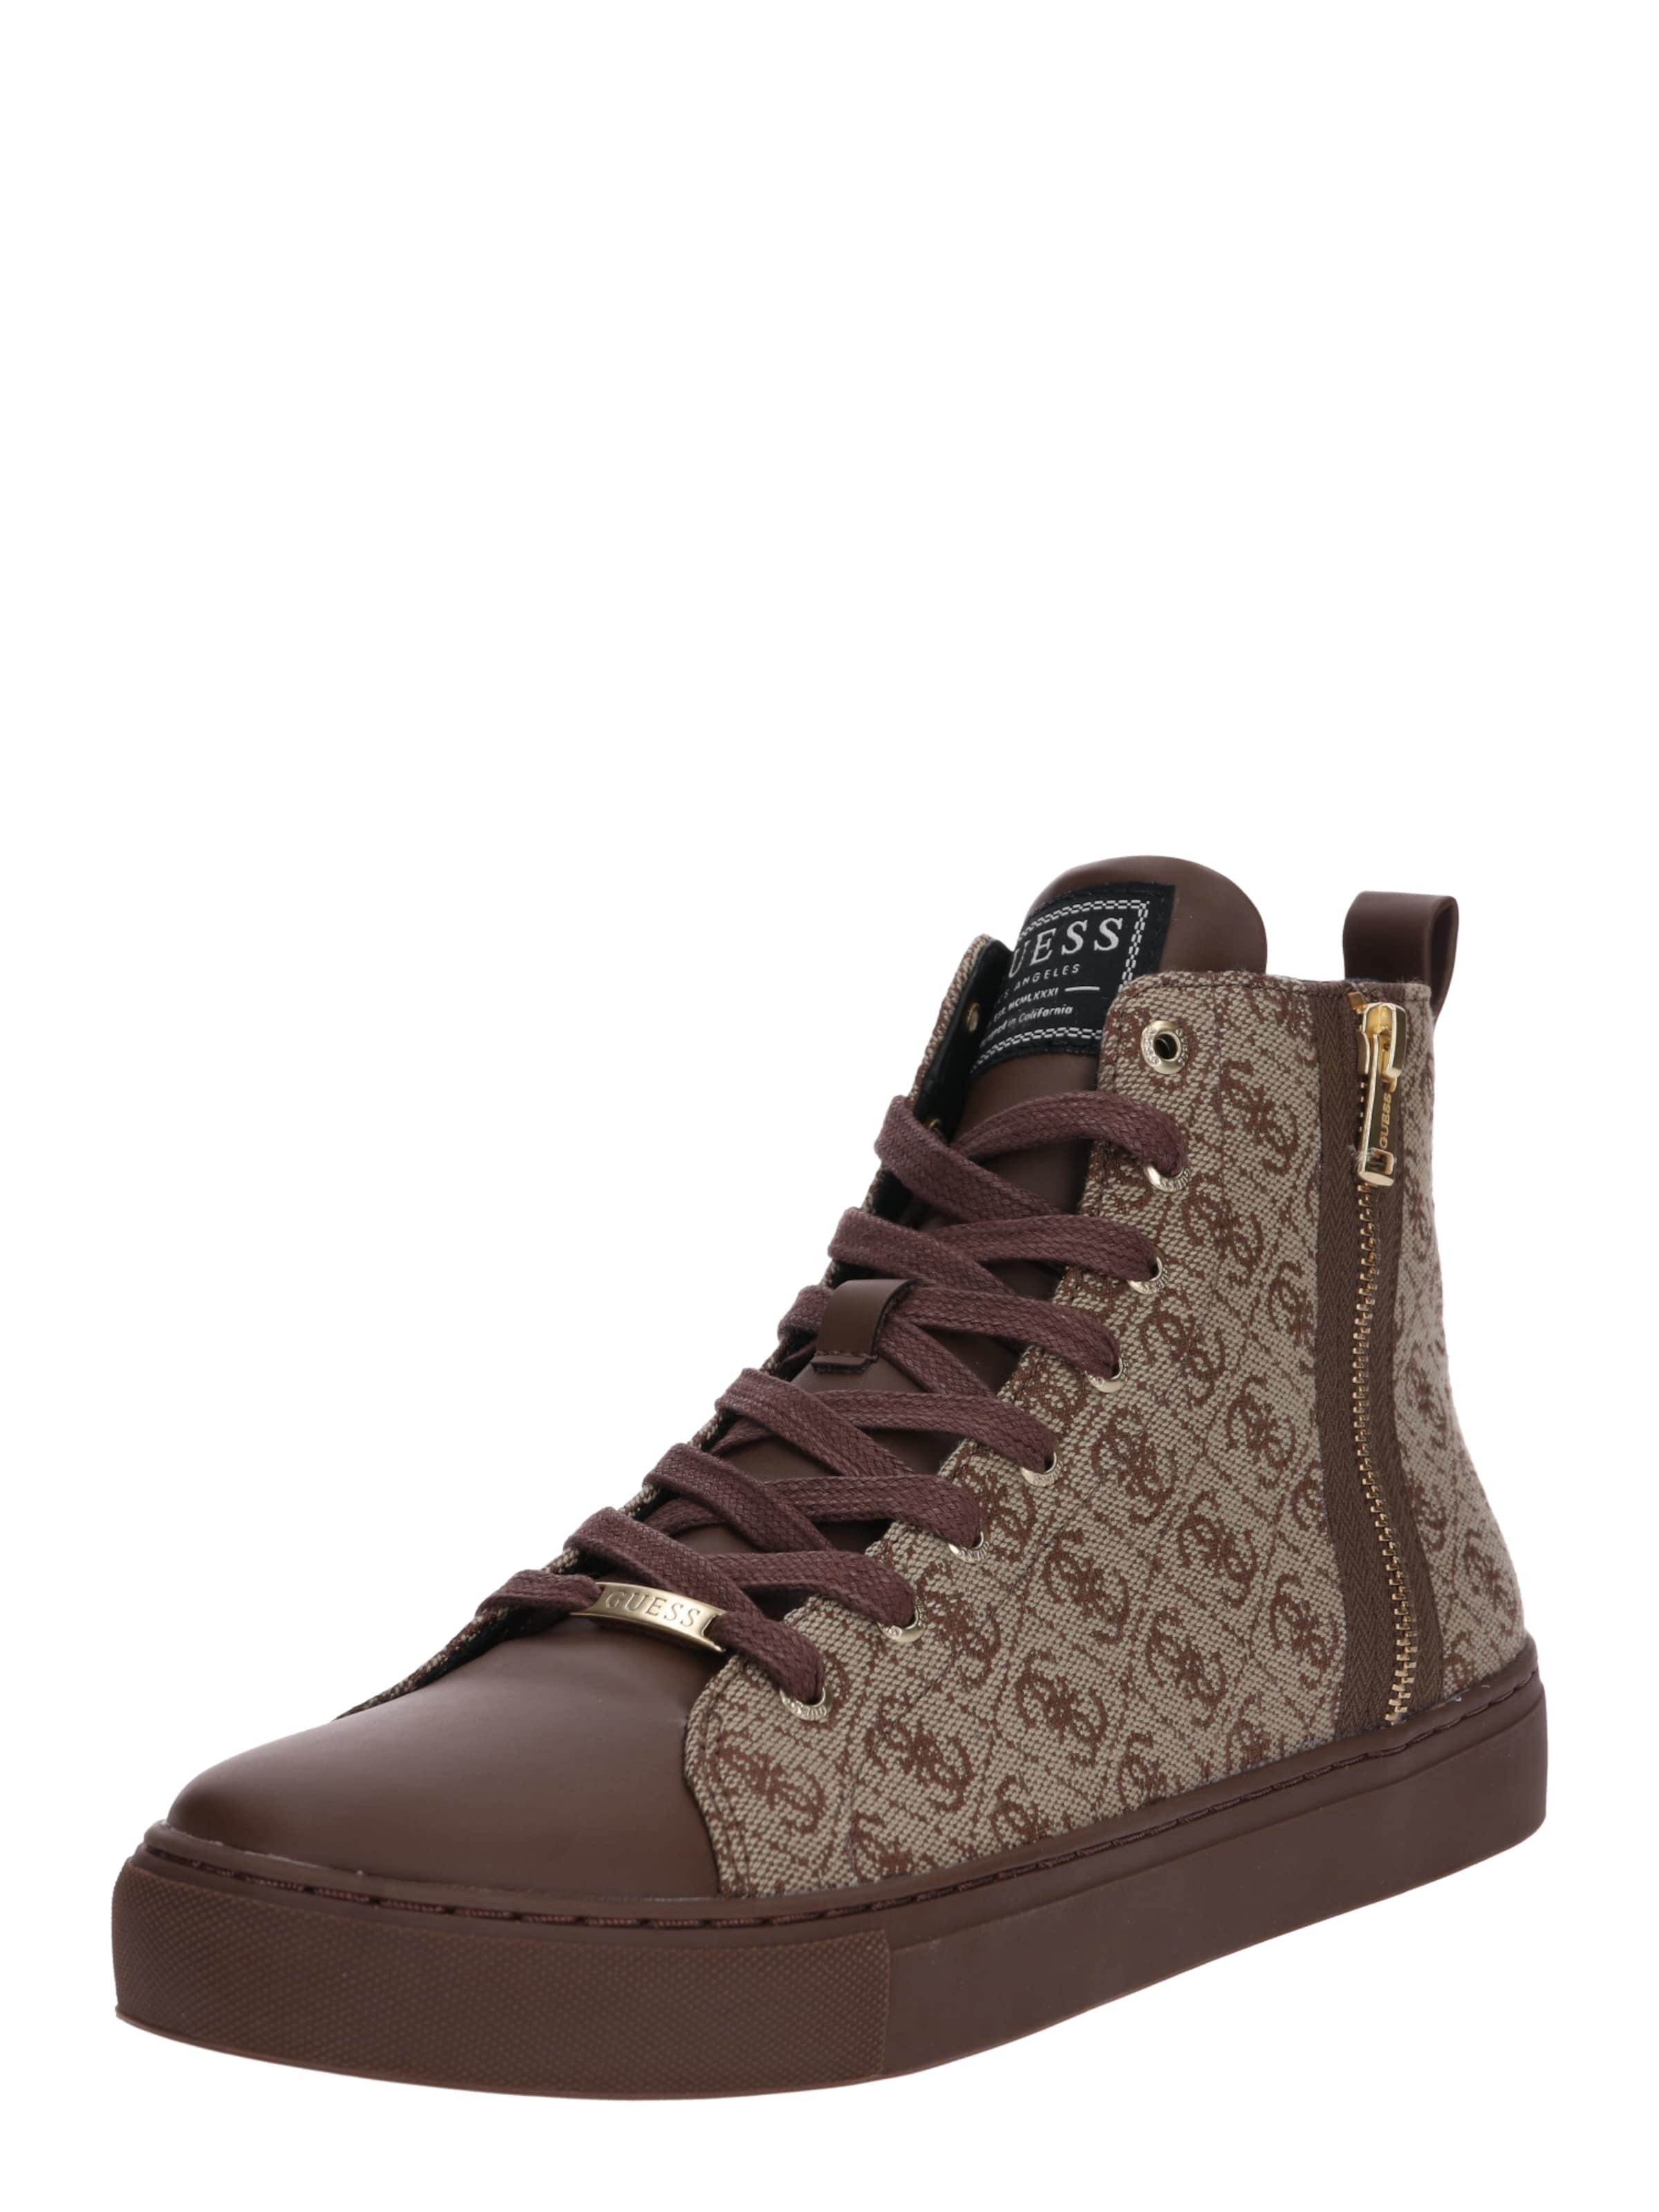 'luiss Mid I' In Sneaker Guess BraunHellbraun uFK513TlJc